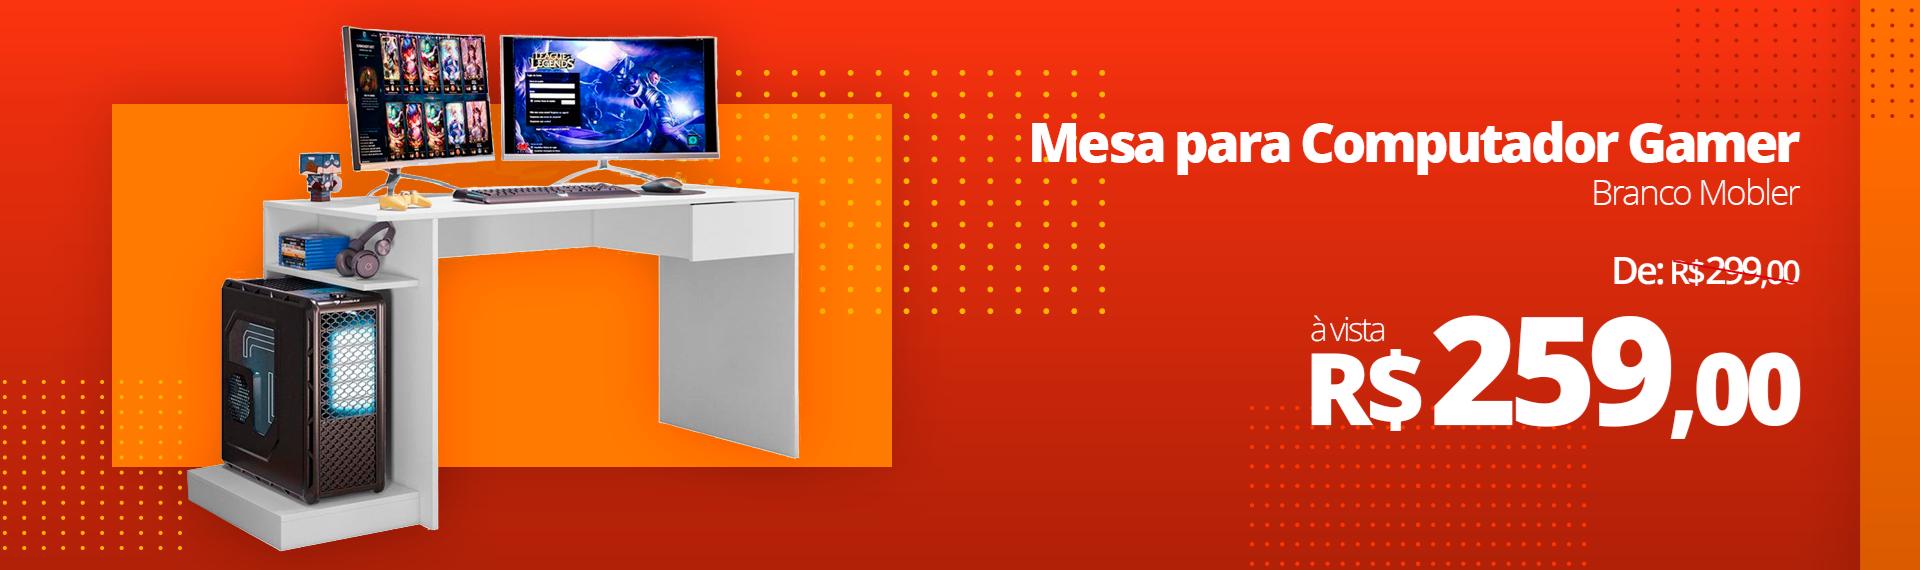 Mesa Para Computador Gamer